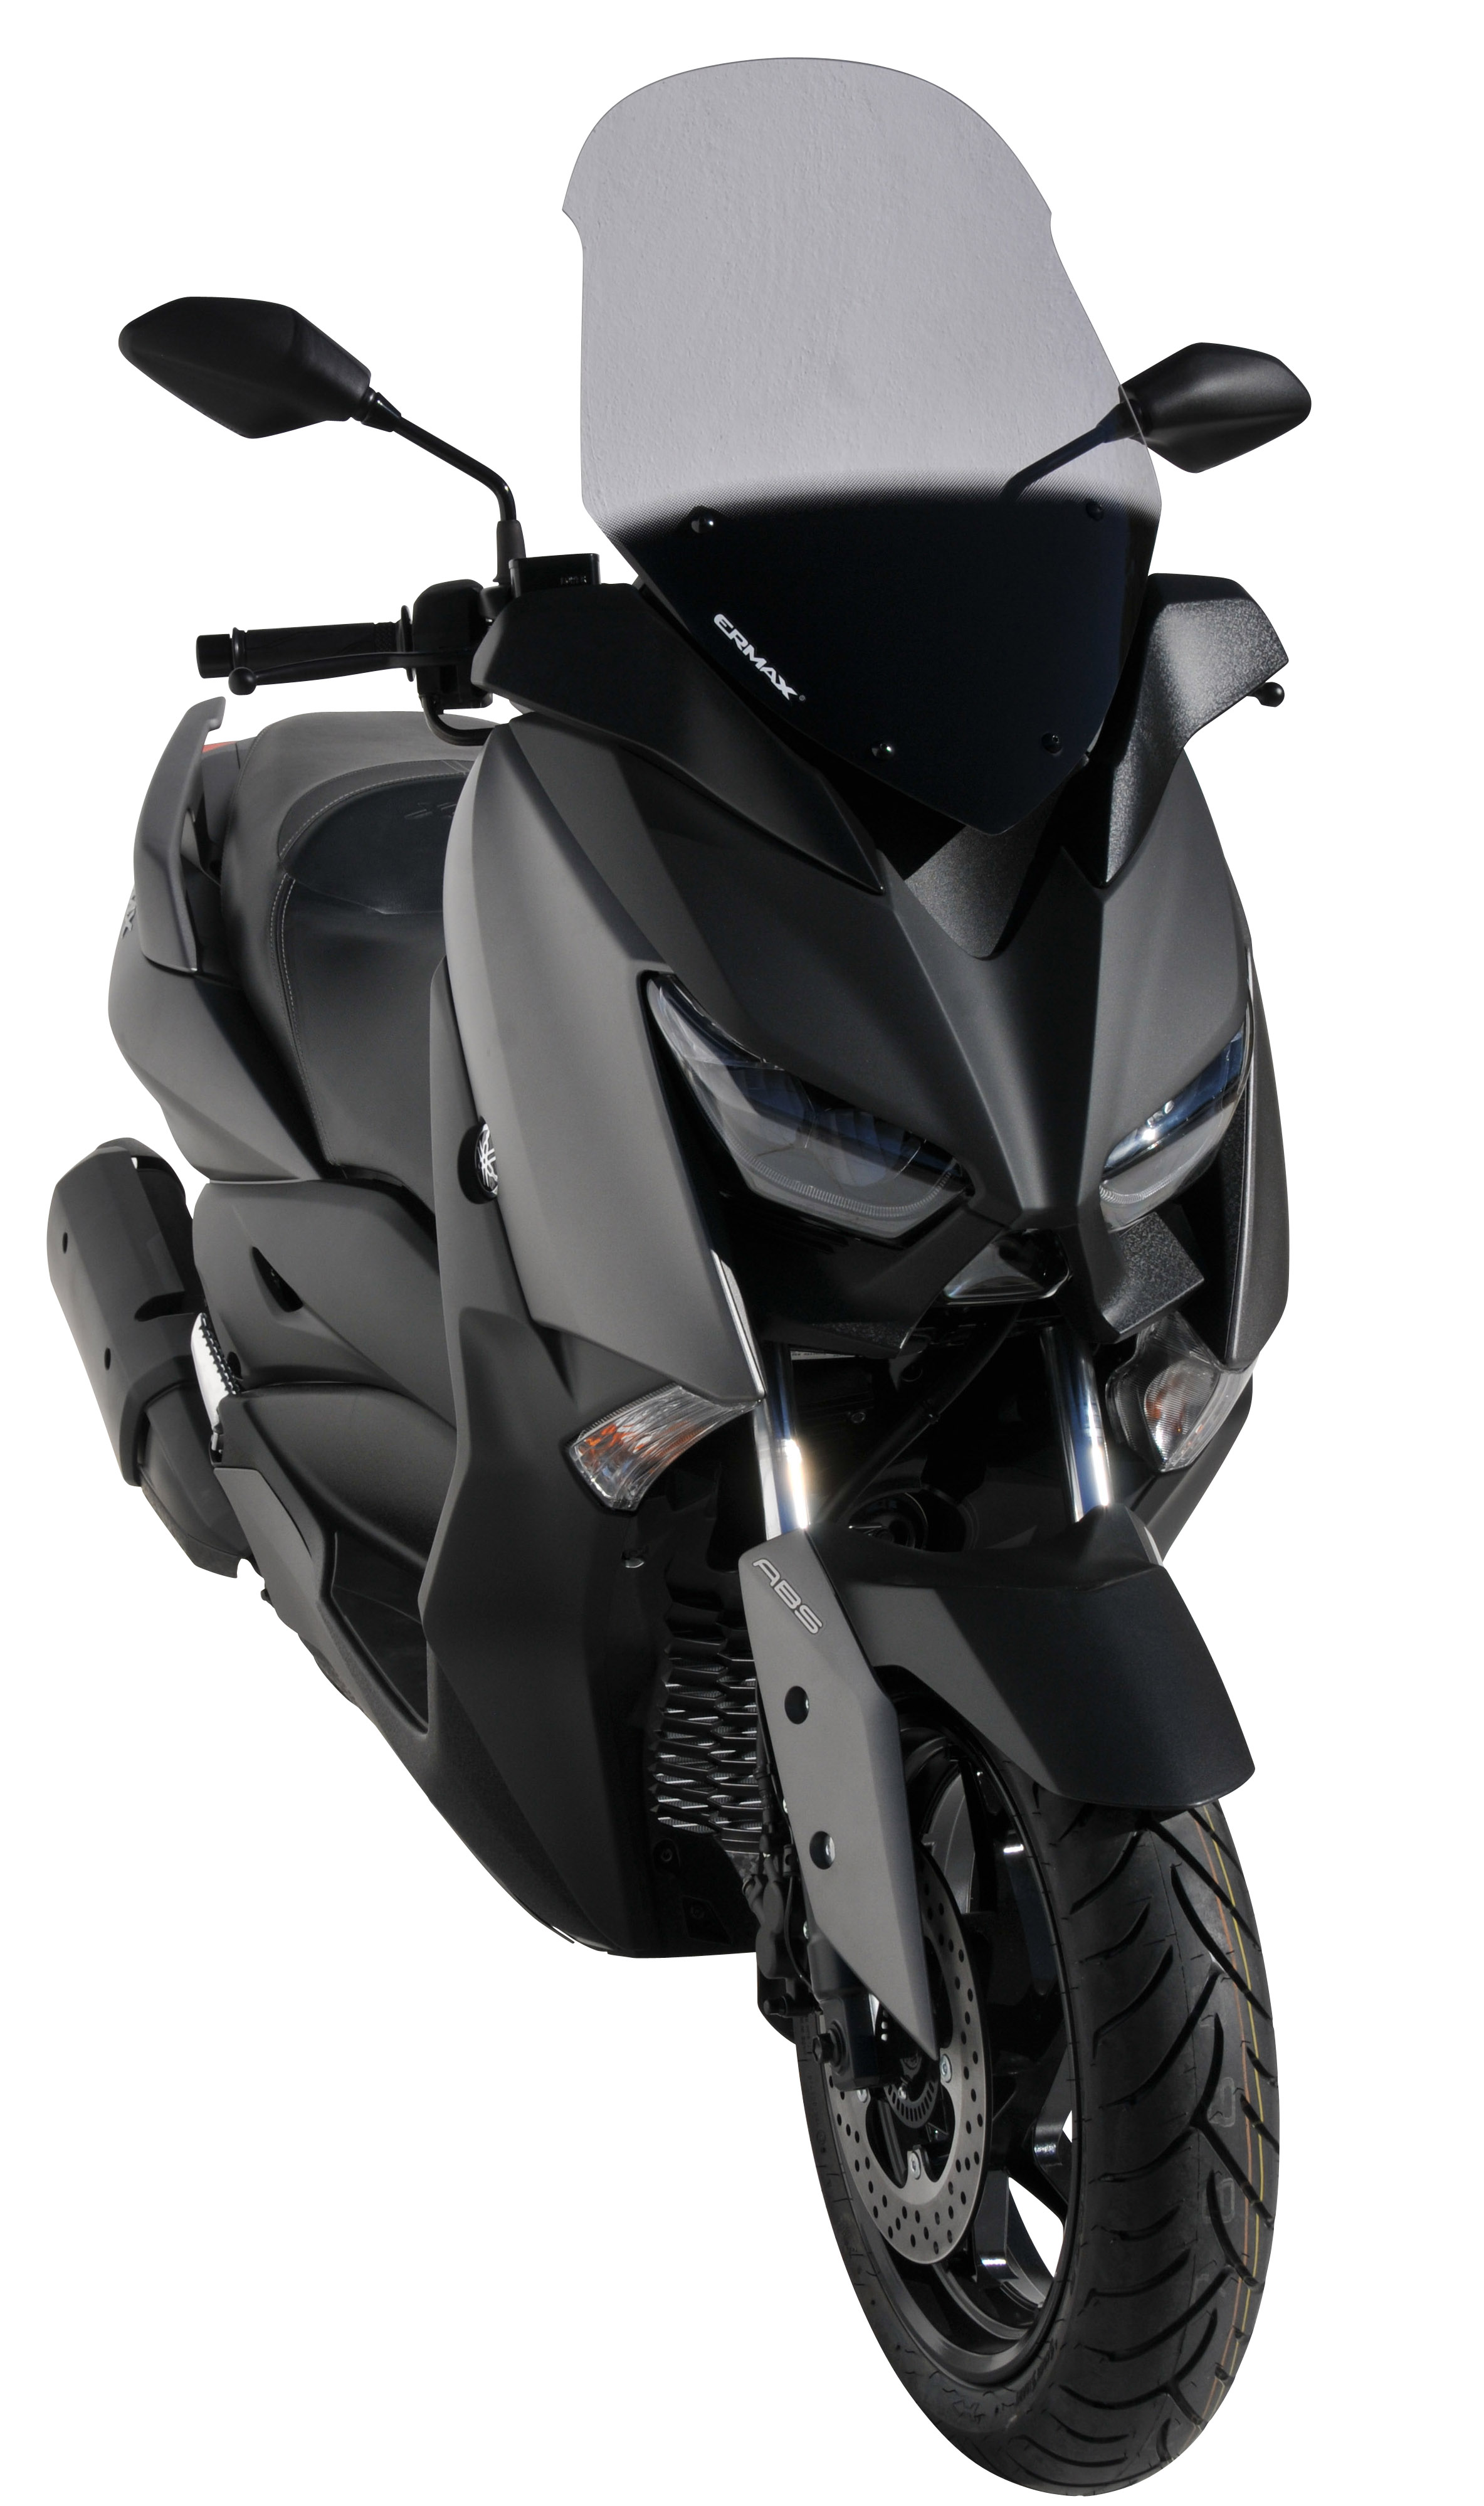 Pare brise haute protection 58cm Ermax X-Max 300 (17-18)